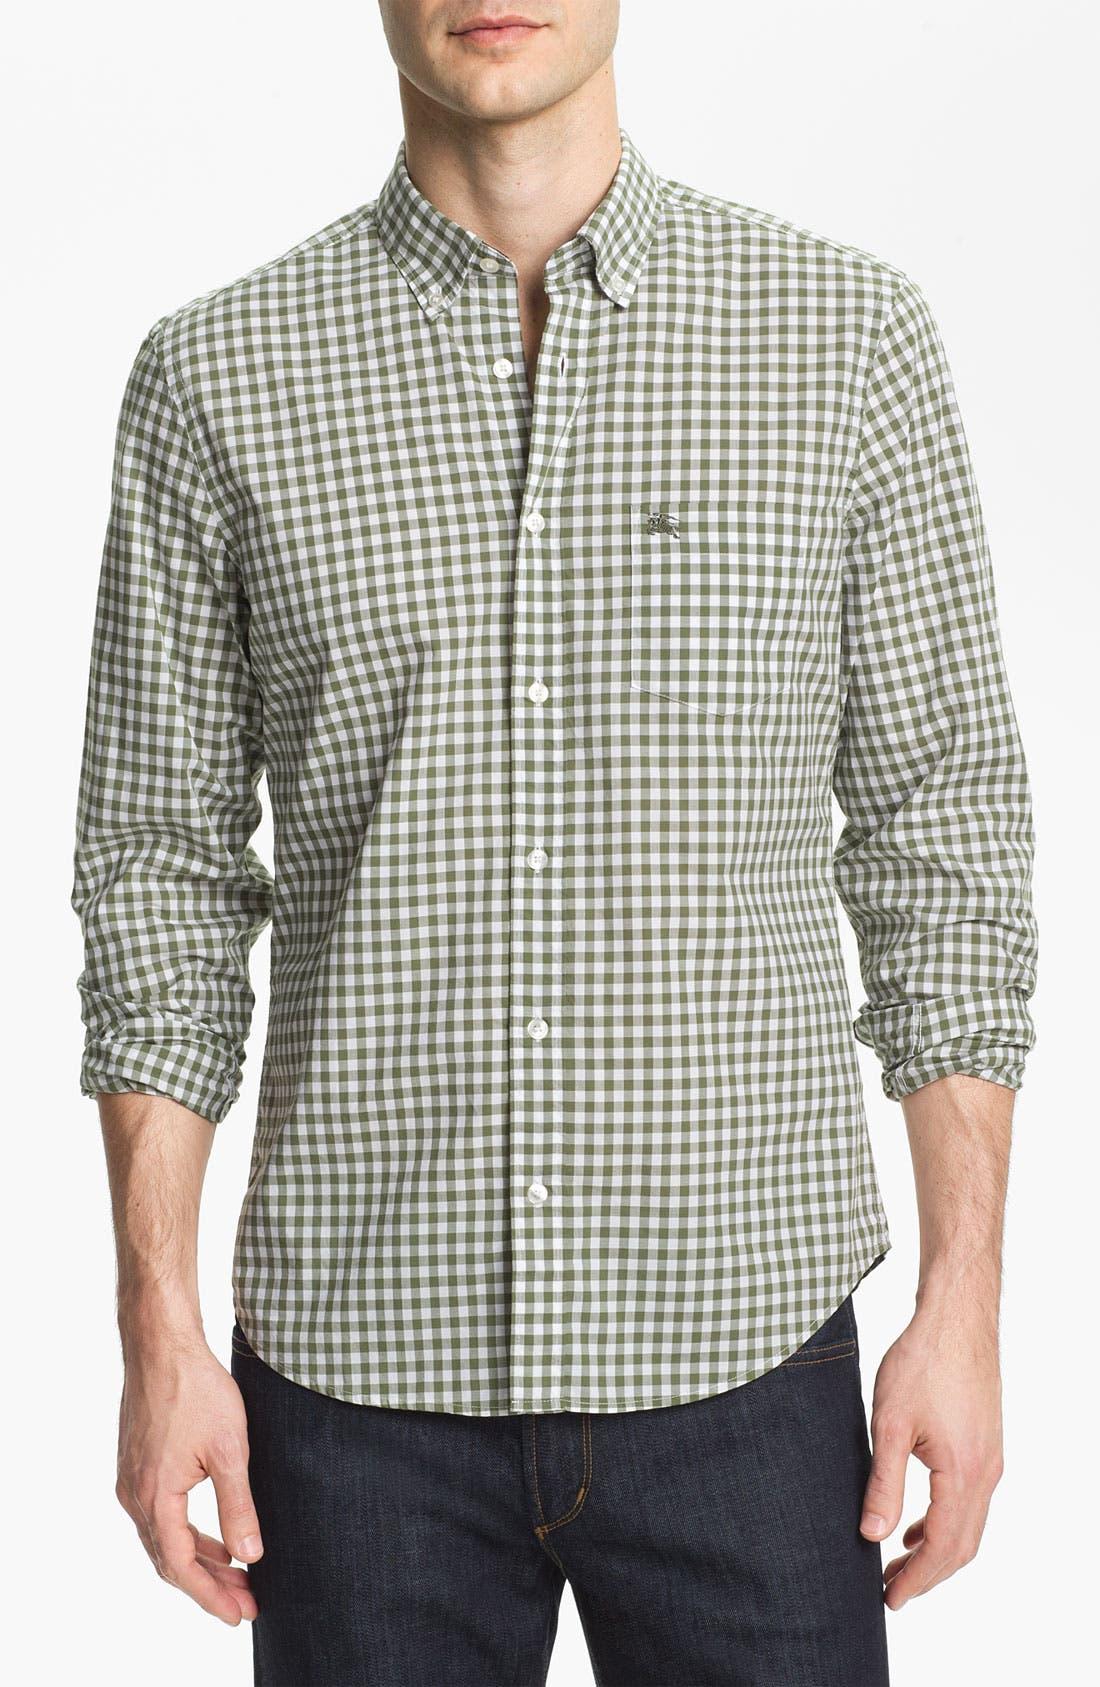 Main Image - Burberry Brit Gingham Check Sport Shirt